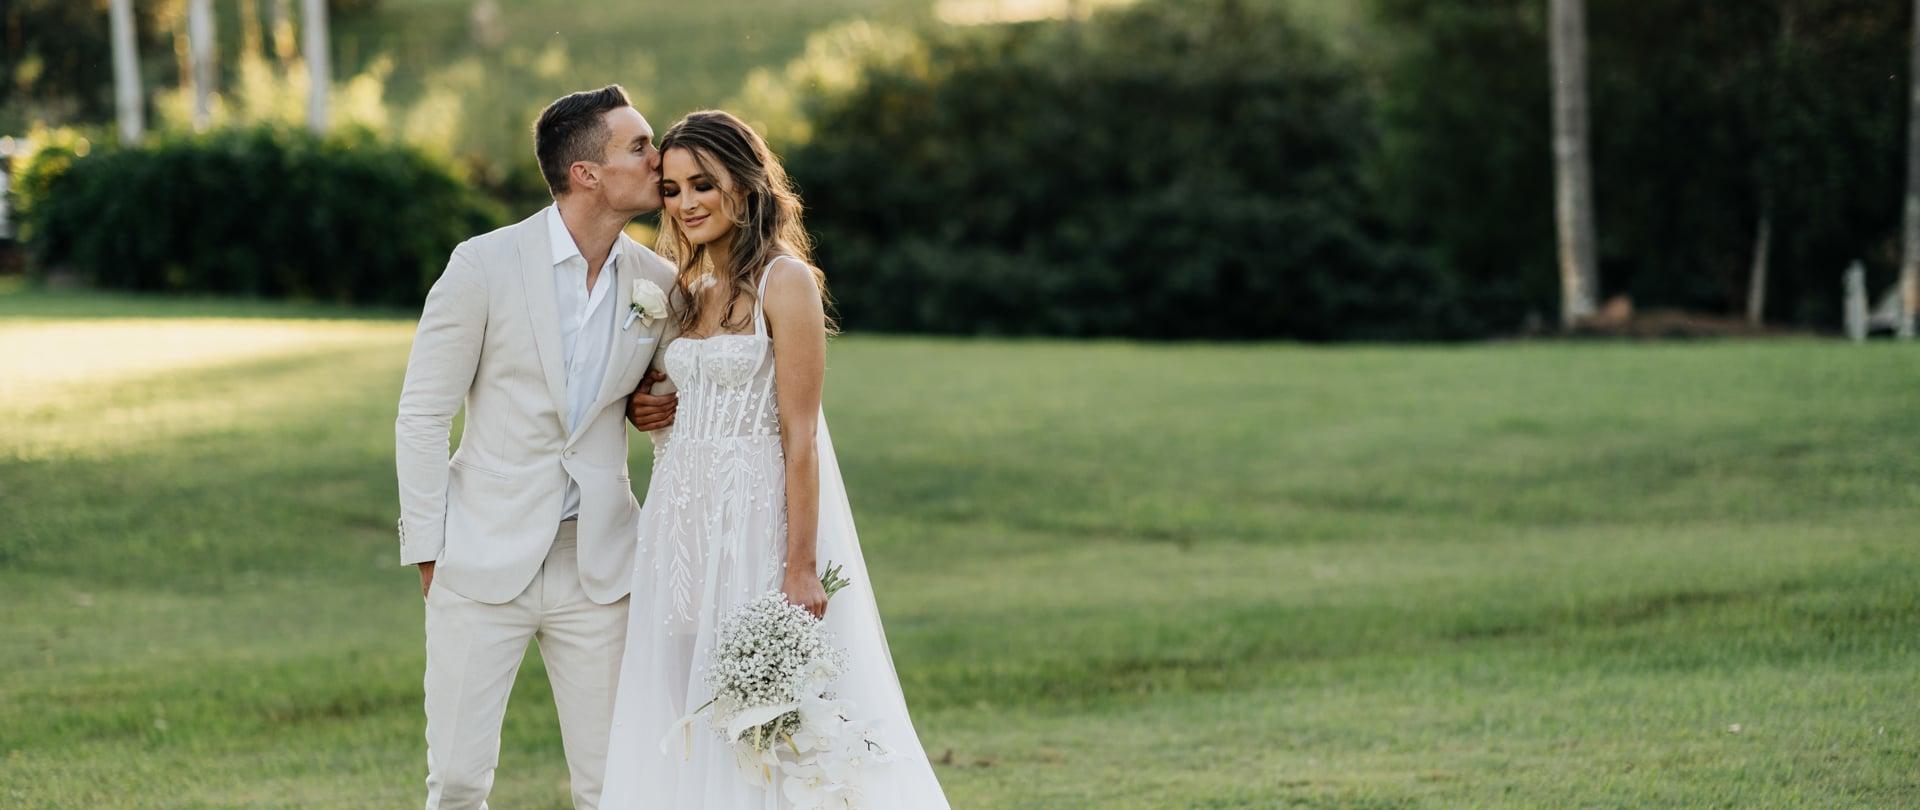 Mimi & Tom Wedding Video Filmed at Gold Coast, Queensland